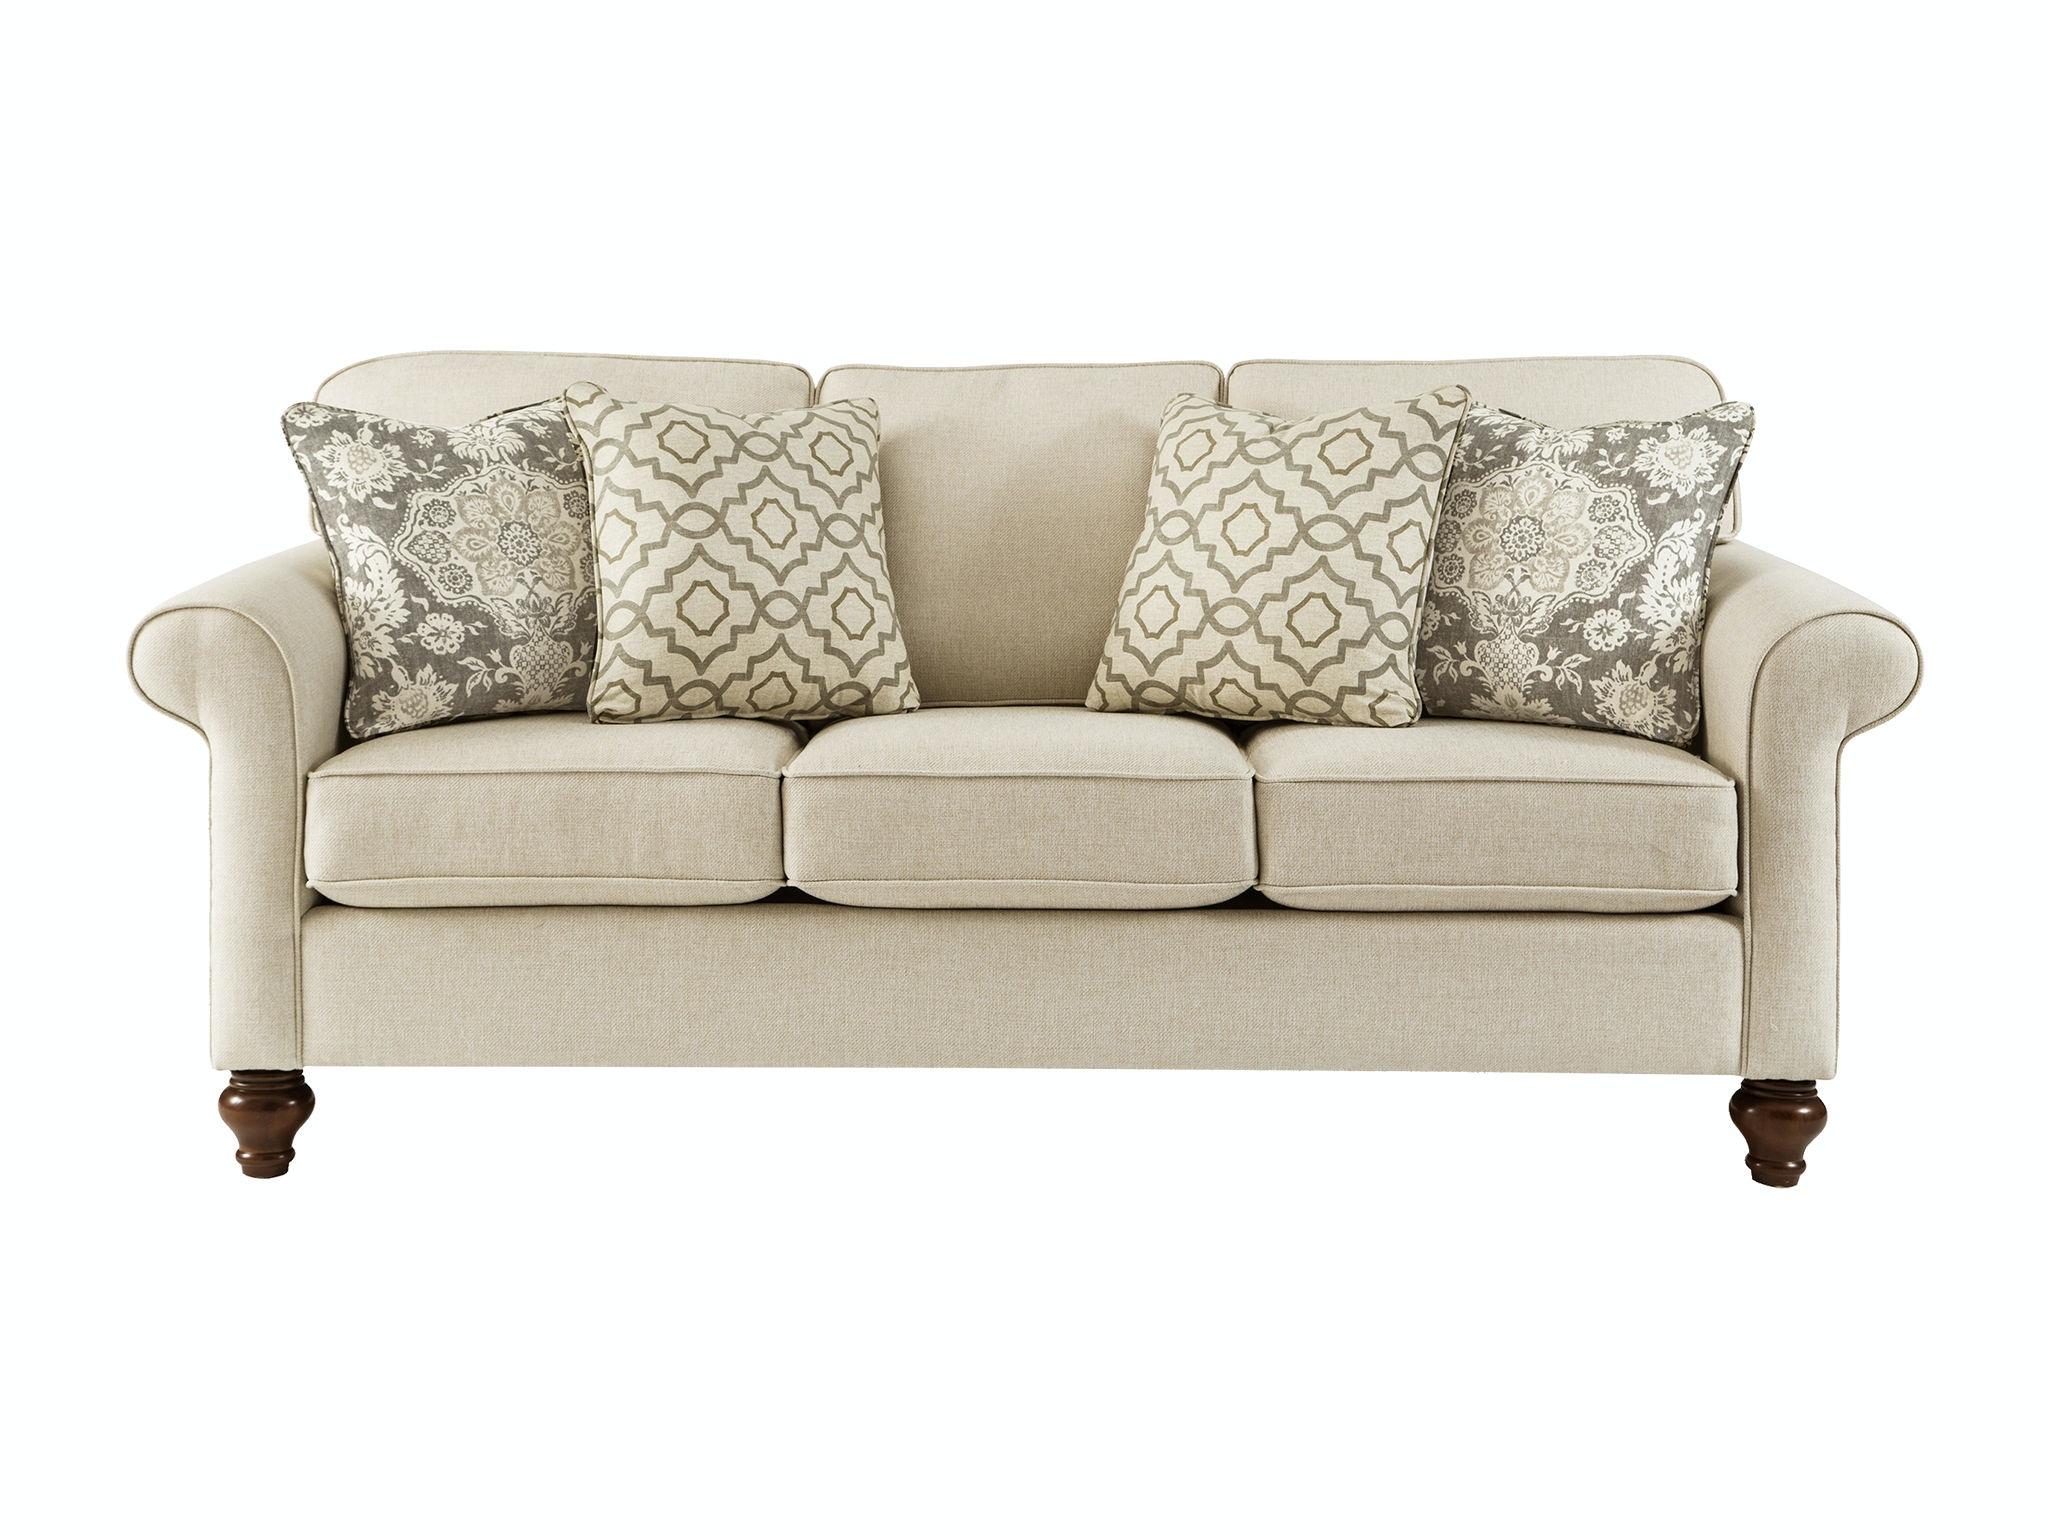 Craftmaster Living Room Sleeper Sofa 77385068 CraftMaster